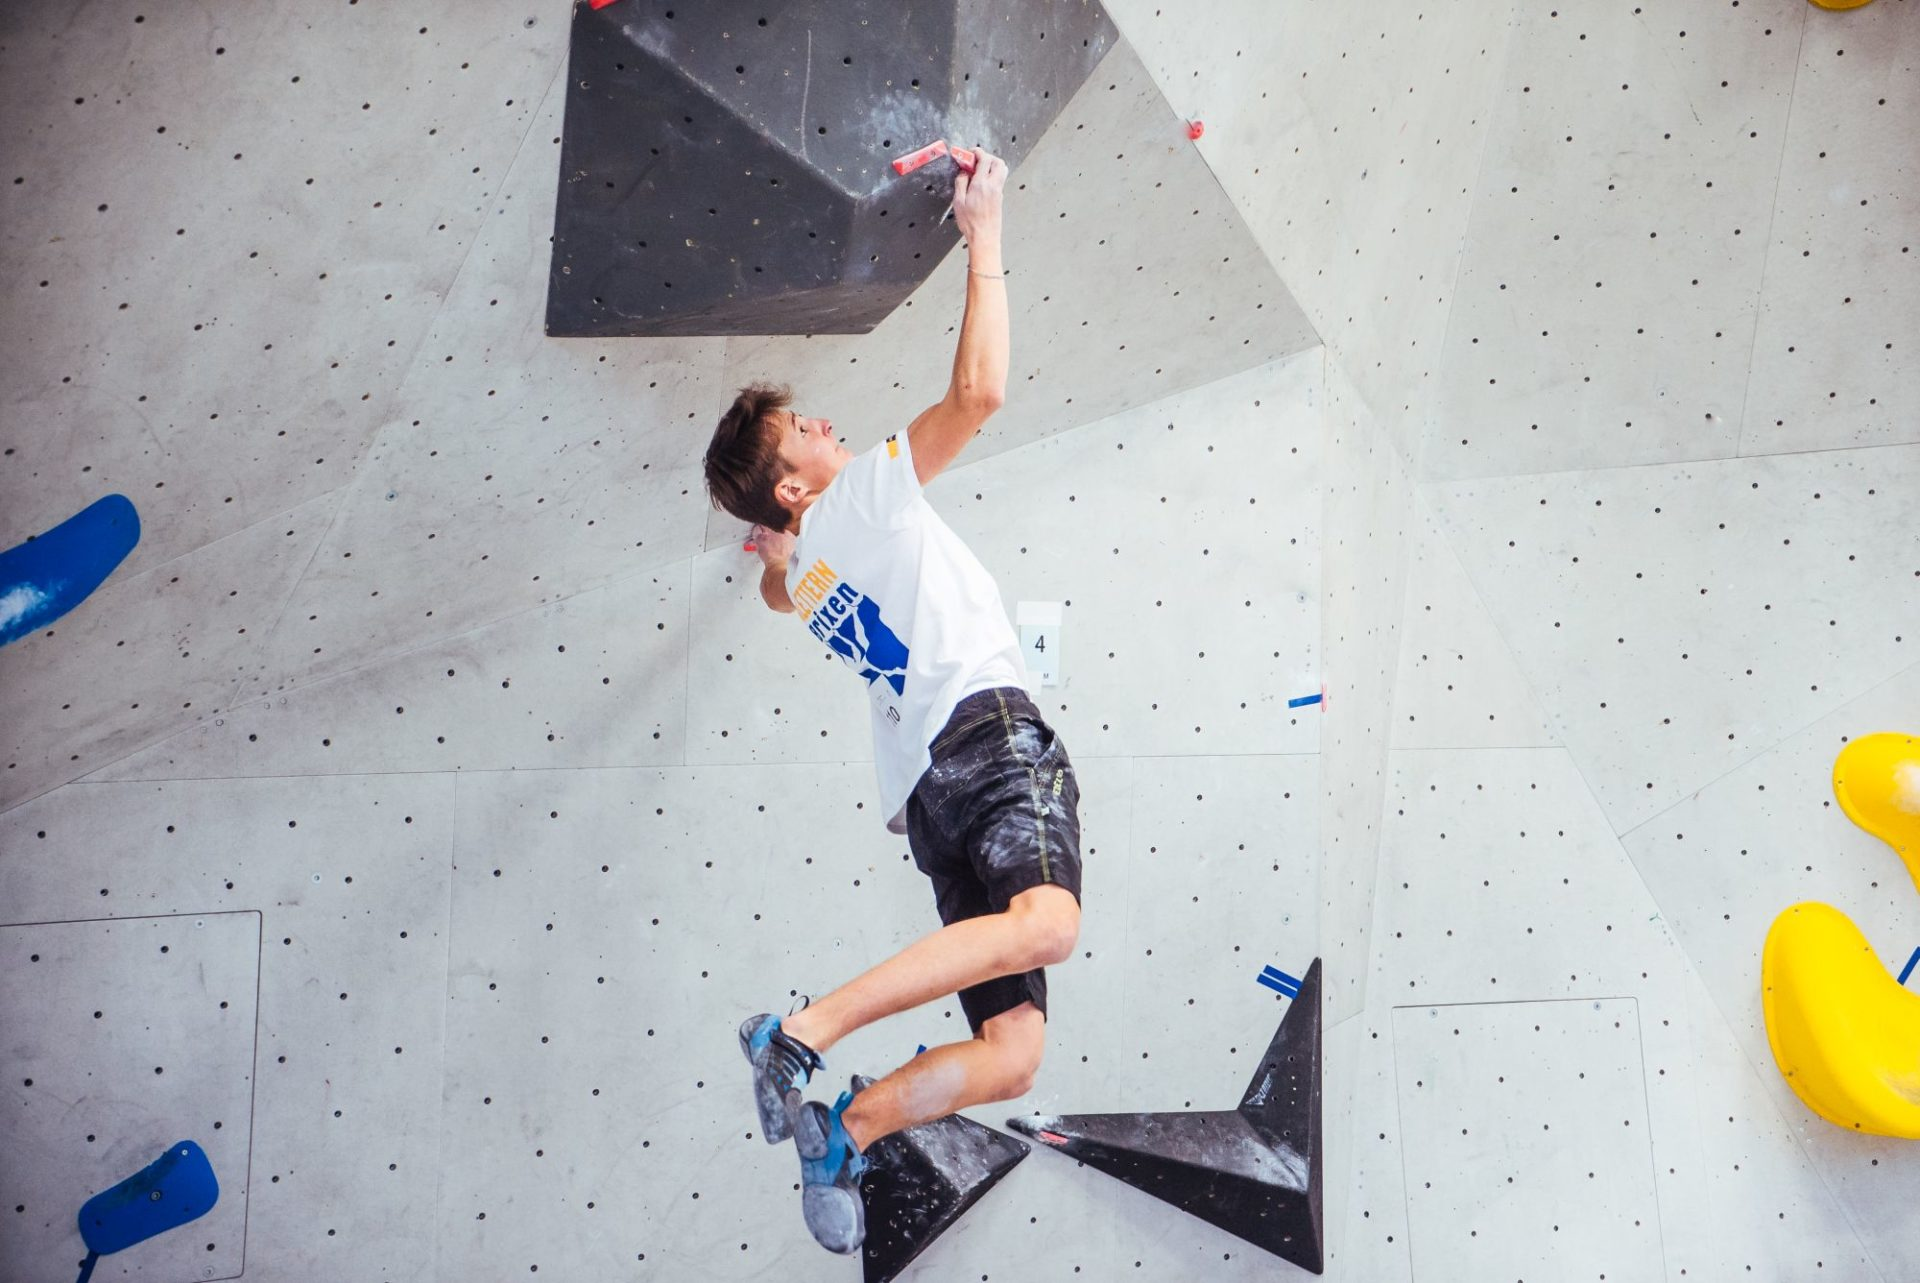 Regionalmeisterschaft Boulder 2021, Vertikale Brixen